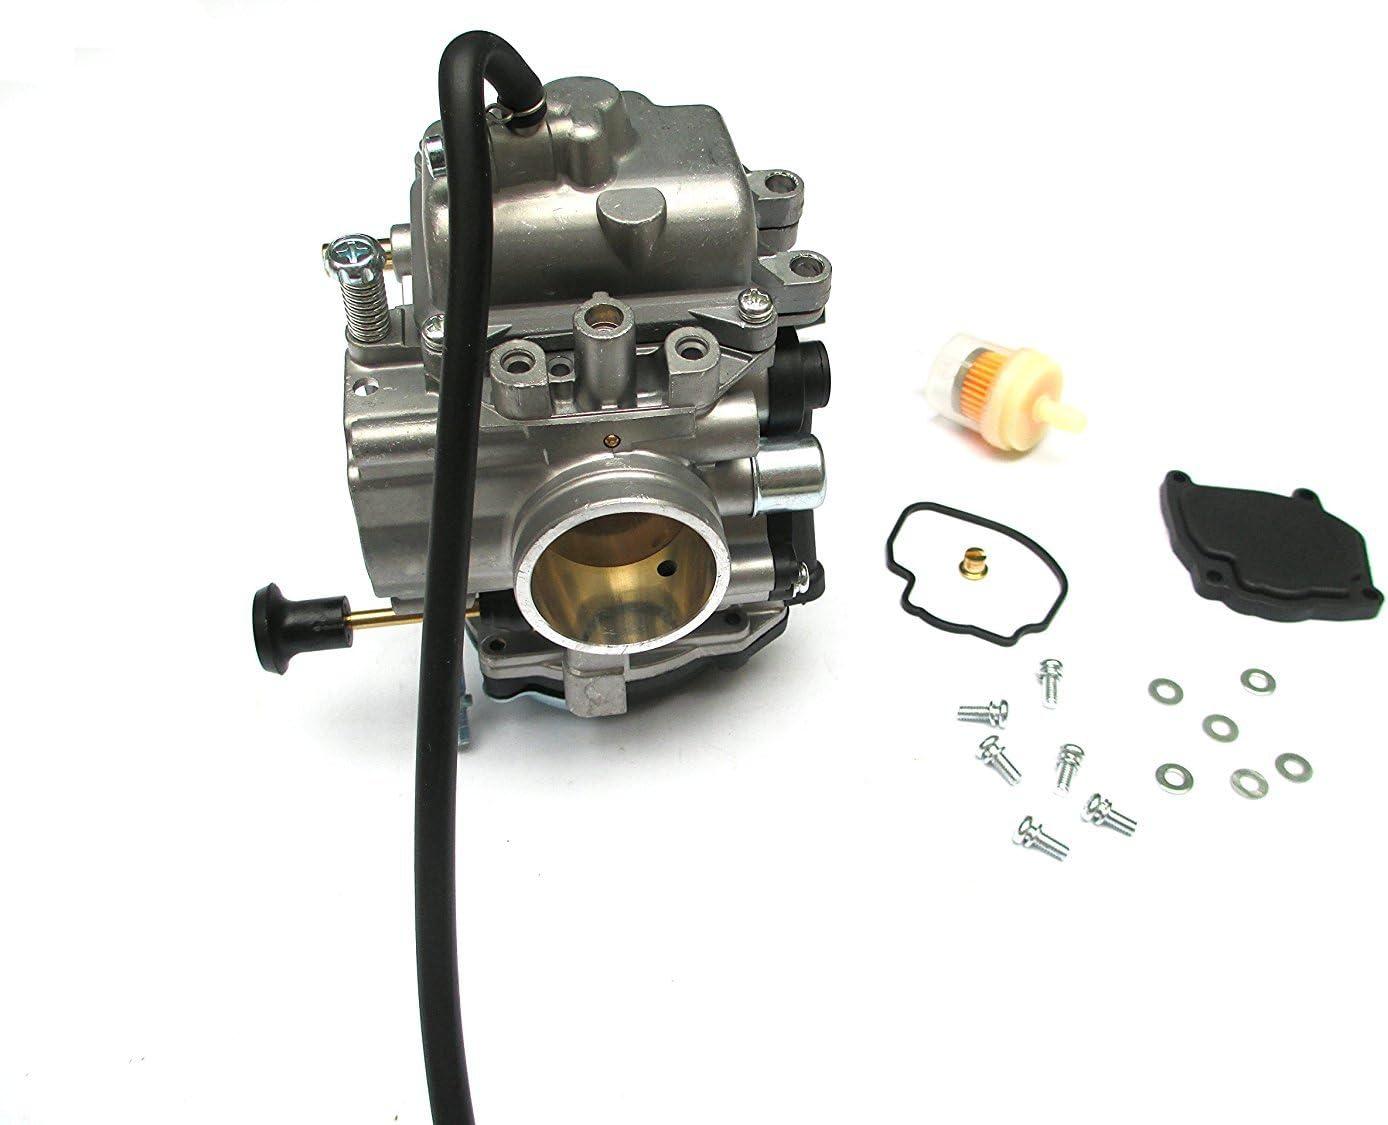 Moose Carburetor Rebuild Kit for Yamaha YFM350FW Big Bear 1987-1996